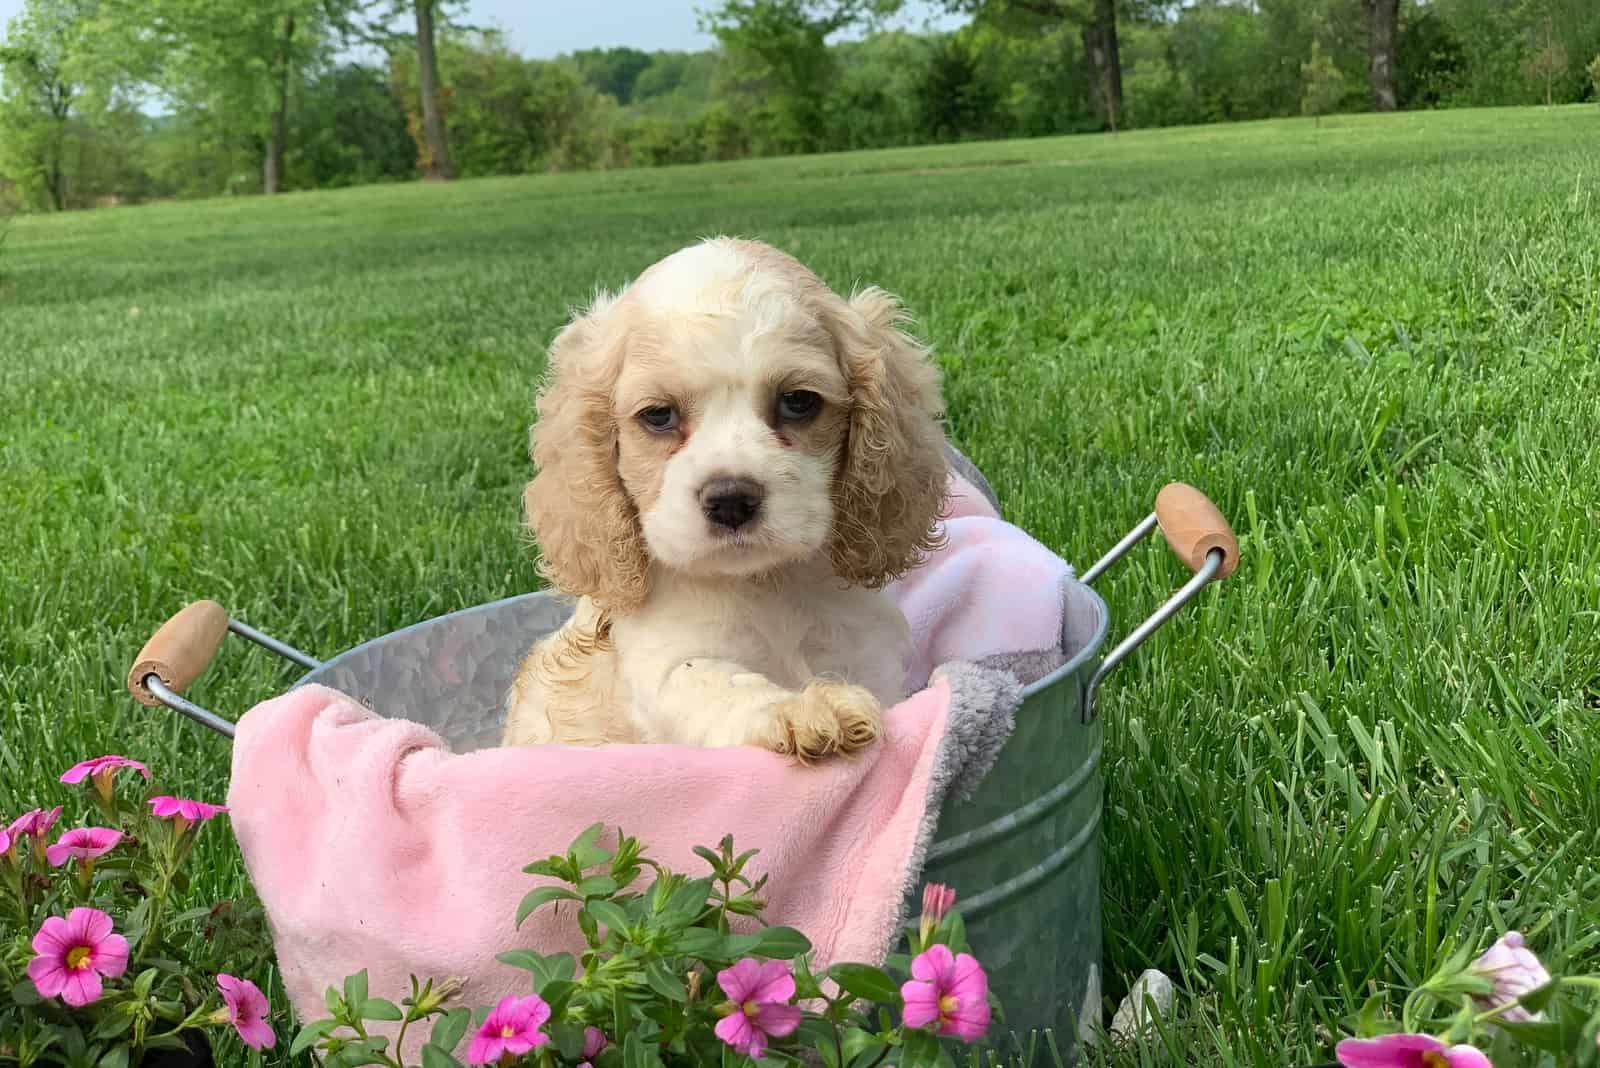 cute little Cocker Spaniel puppy